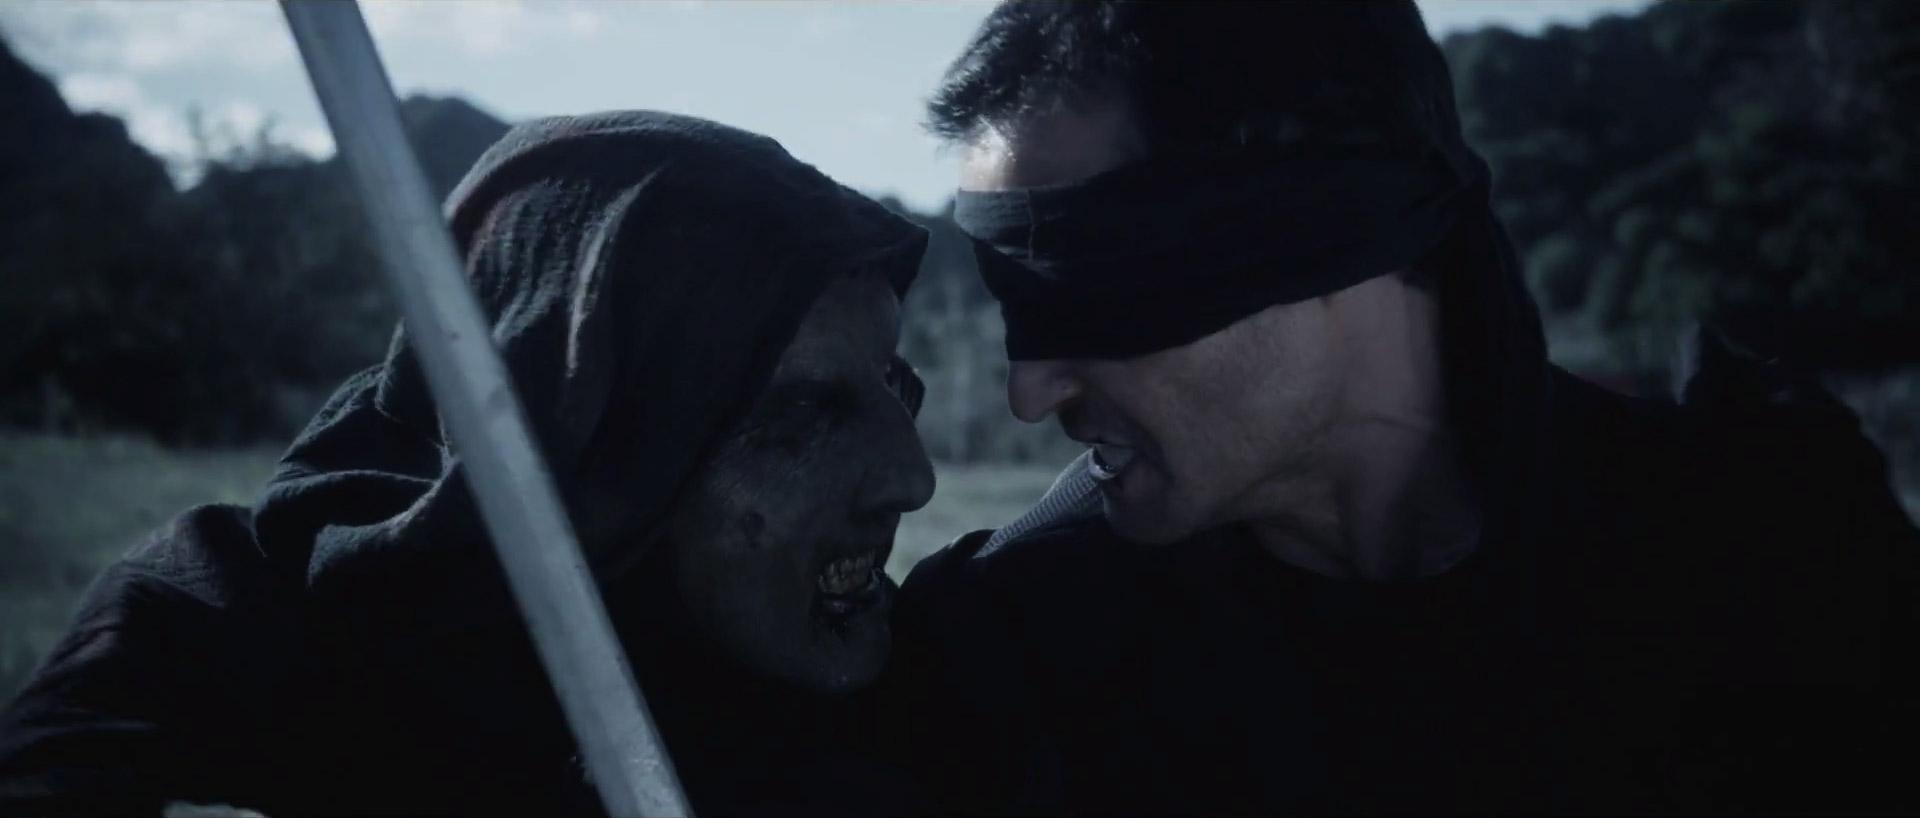 _badass-trailer-for-mortal-kombat-legacy-ii-03.jpg